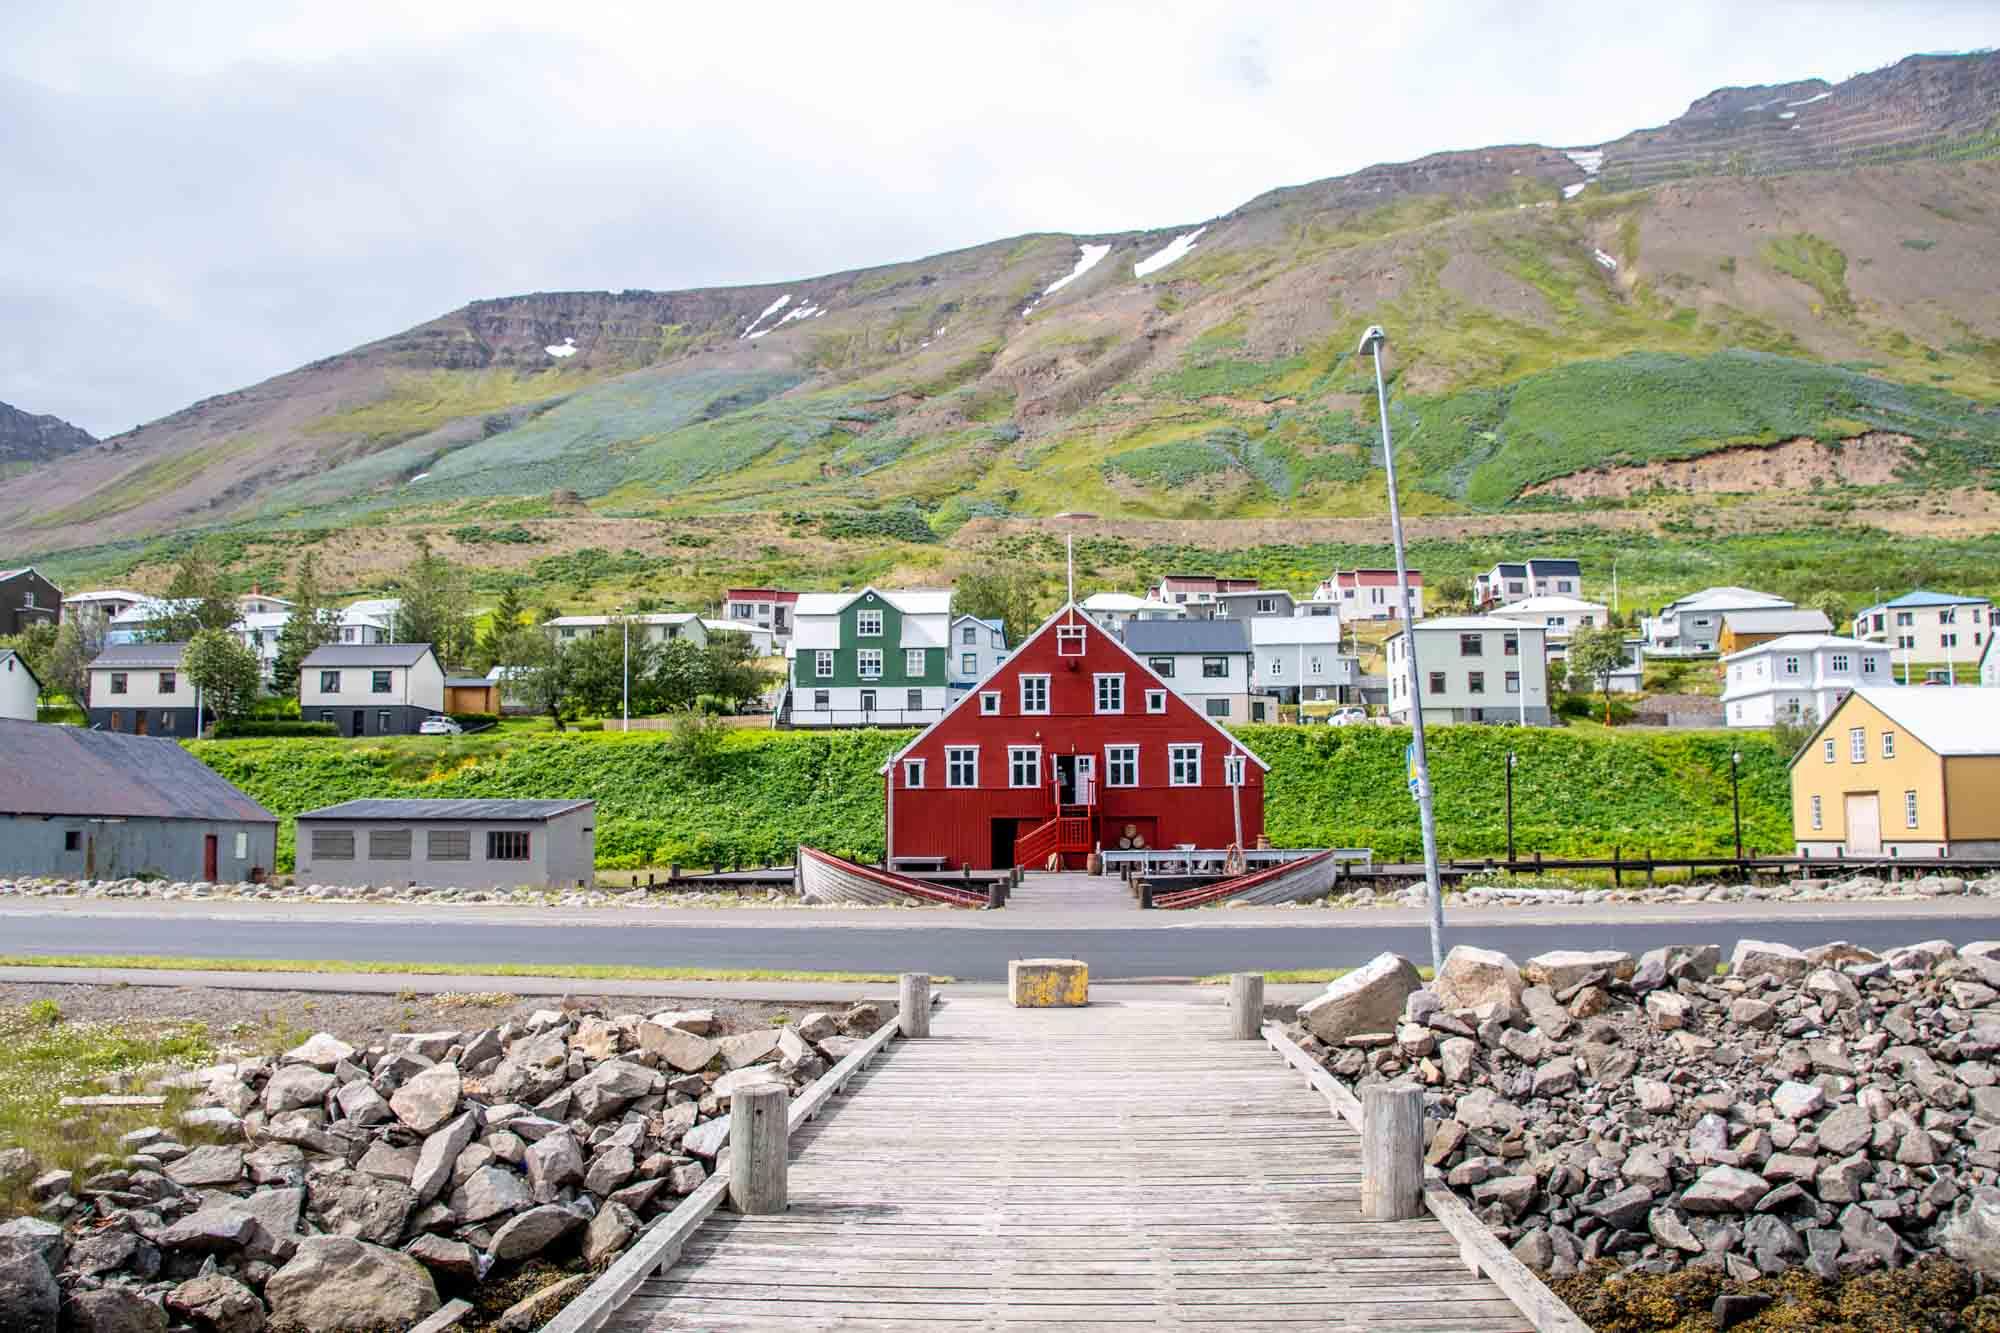 Red herring museum in Siglufjordur